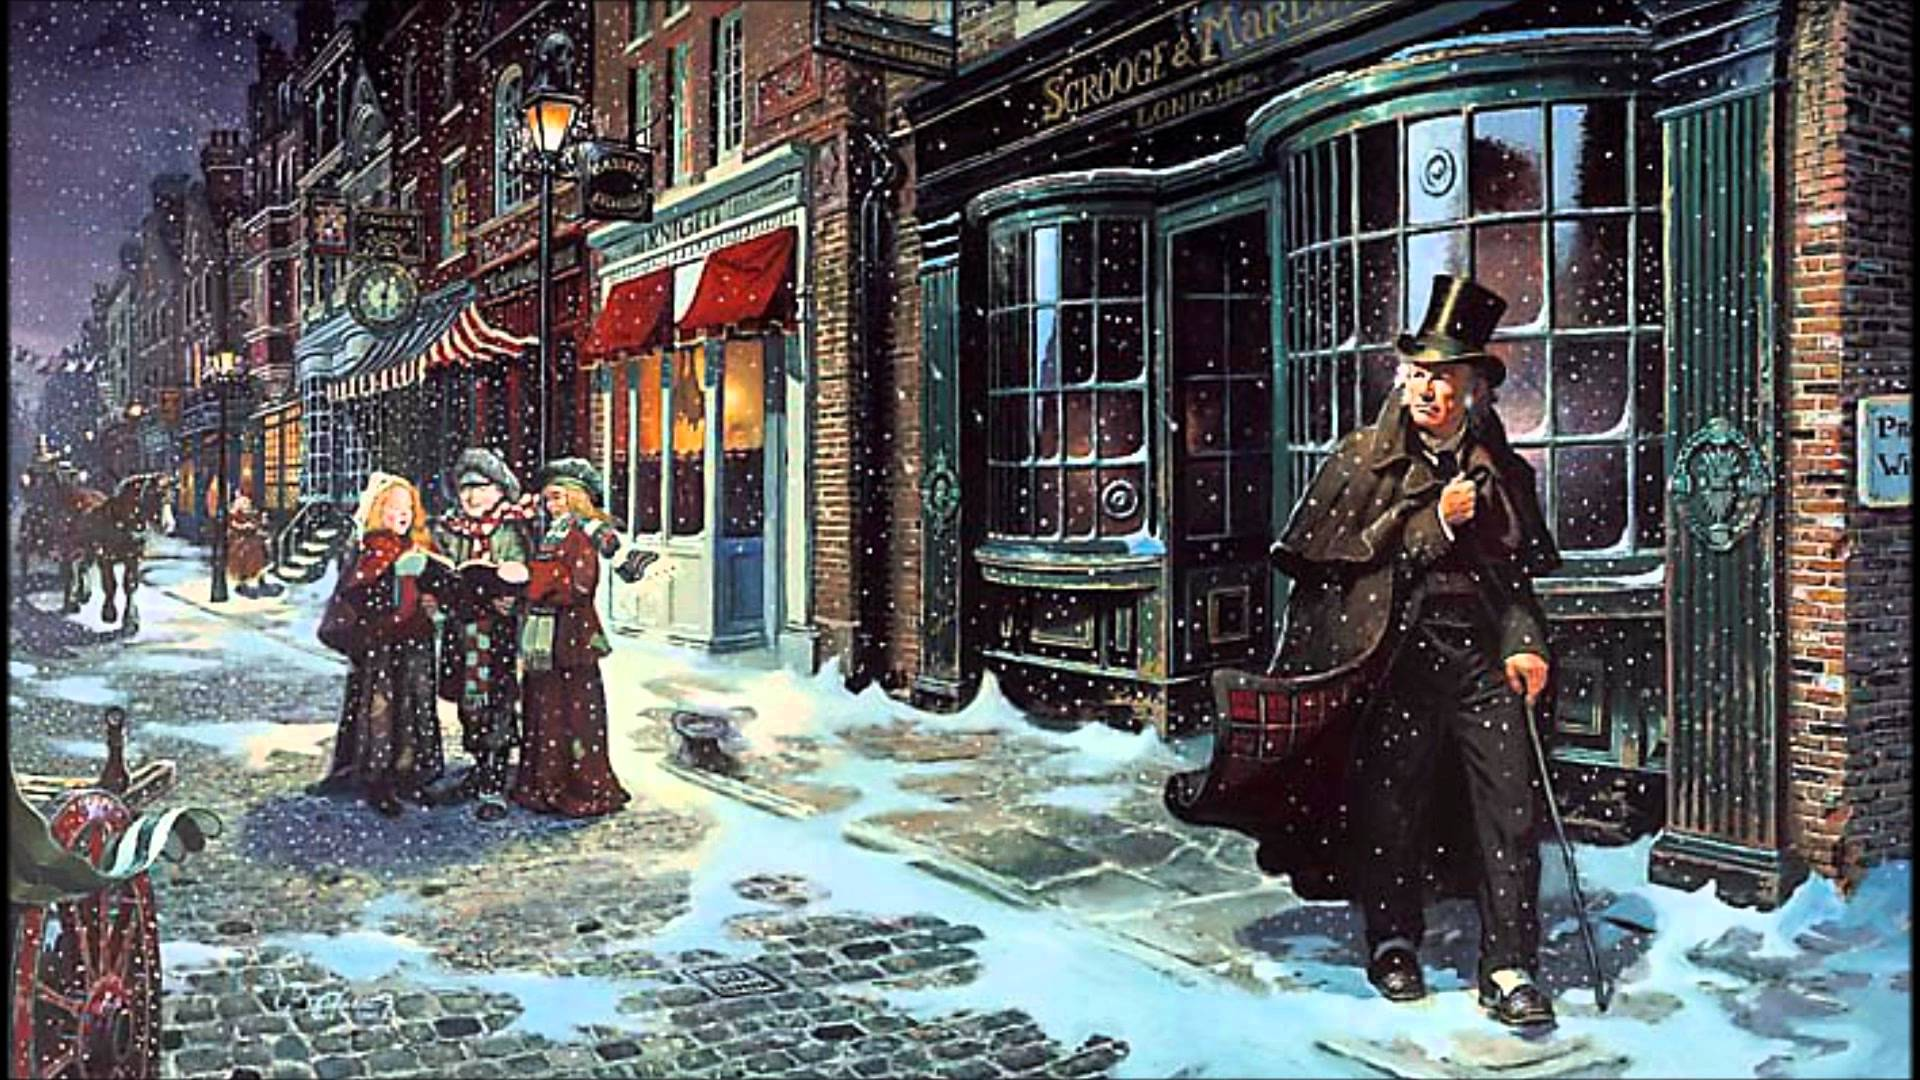 A Christmas Carol Wallpapers - Top Free ...